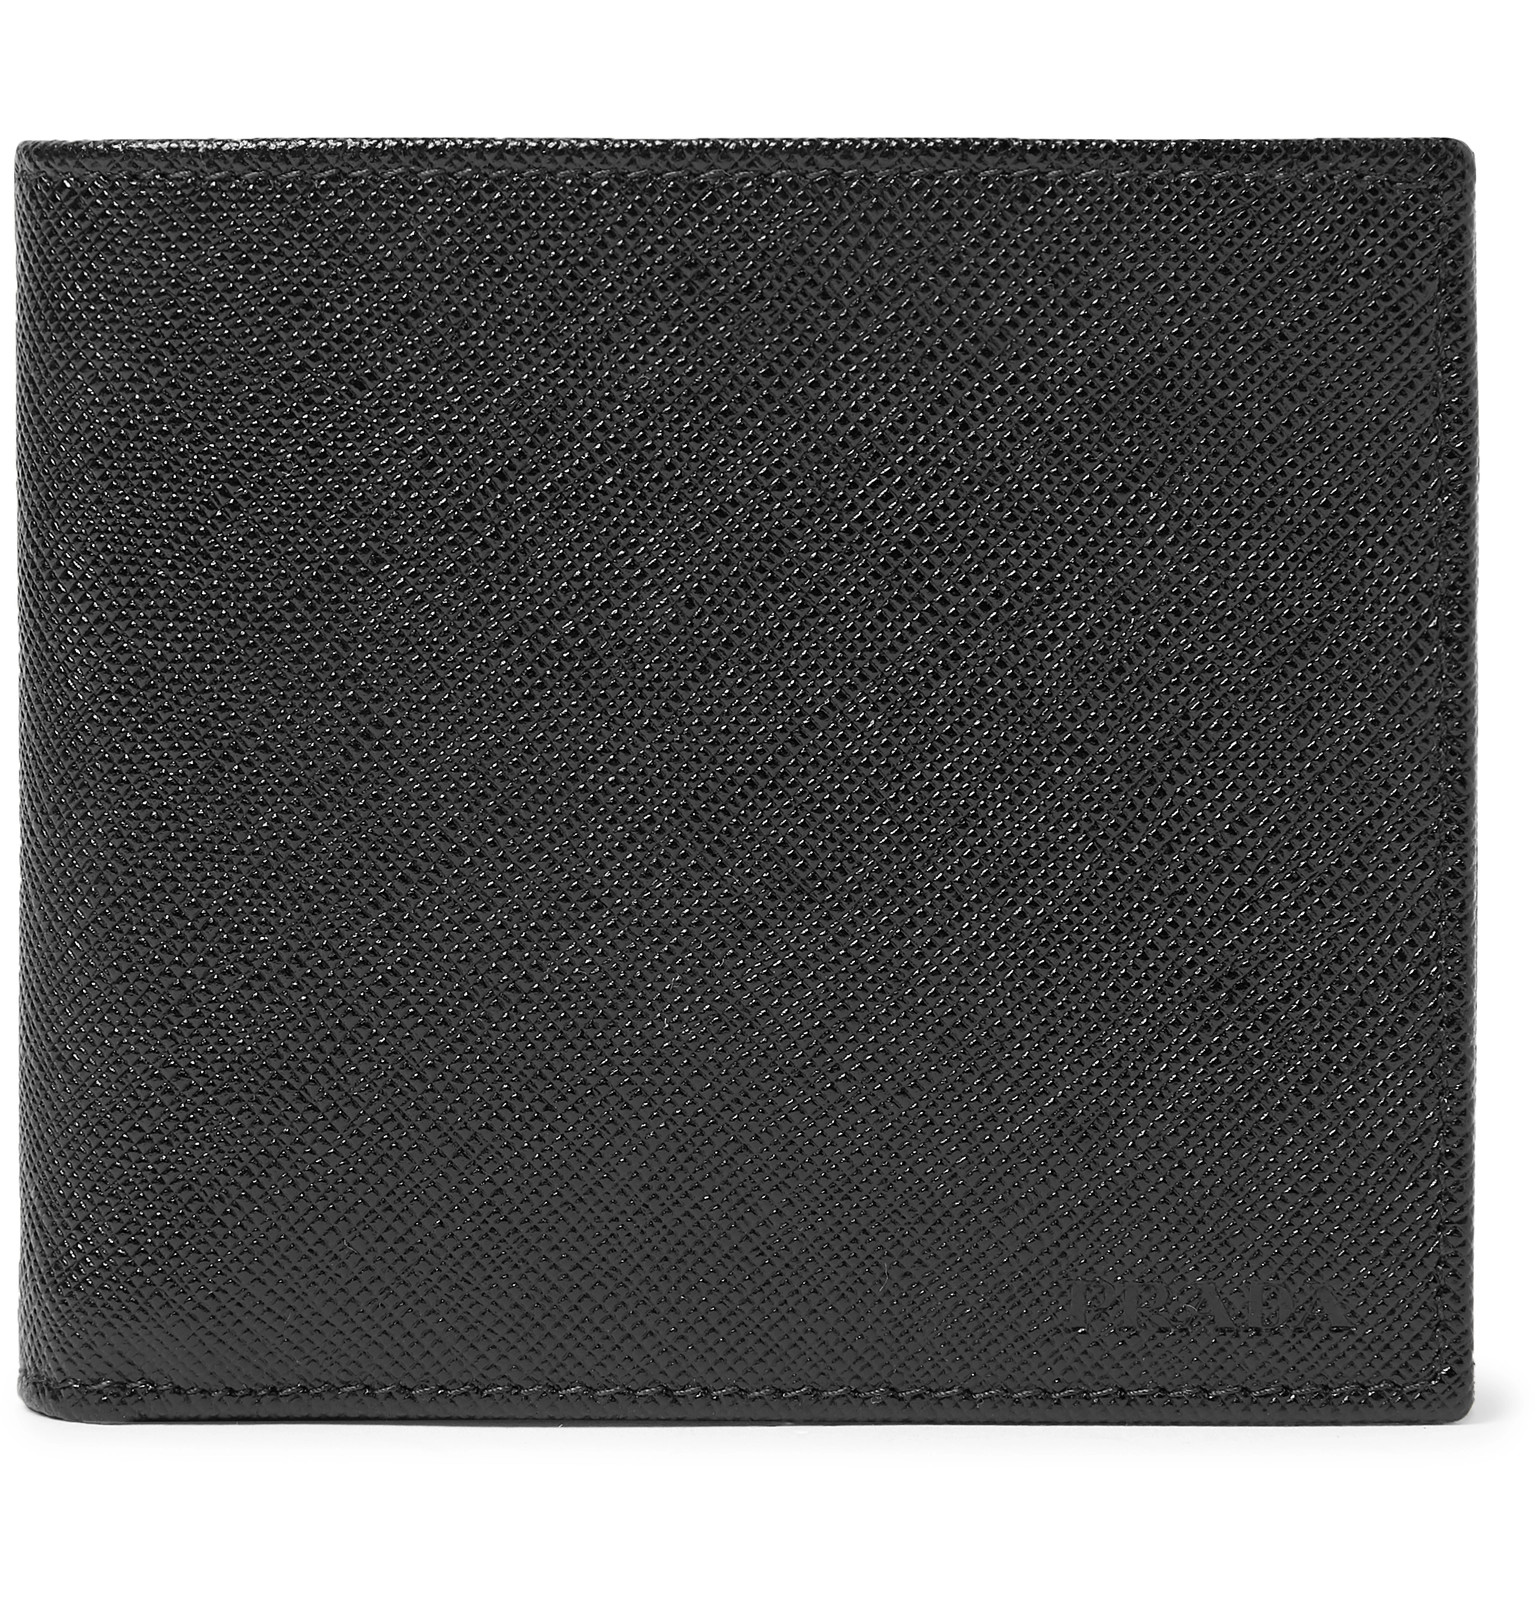 5b309a0bfc4d98 Prada - Logo-Debossed Saffiano Leather Billfold Wallet